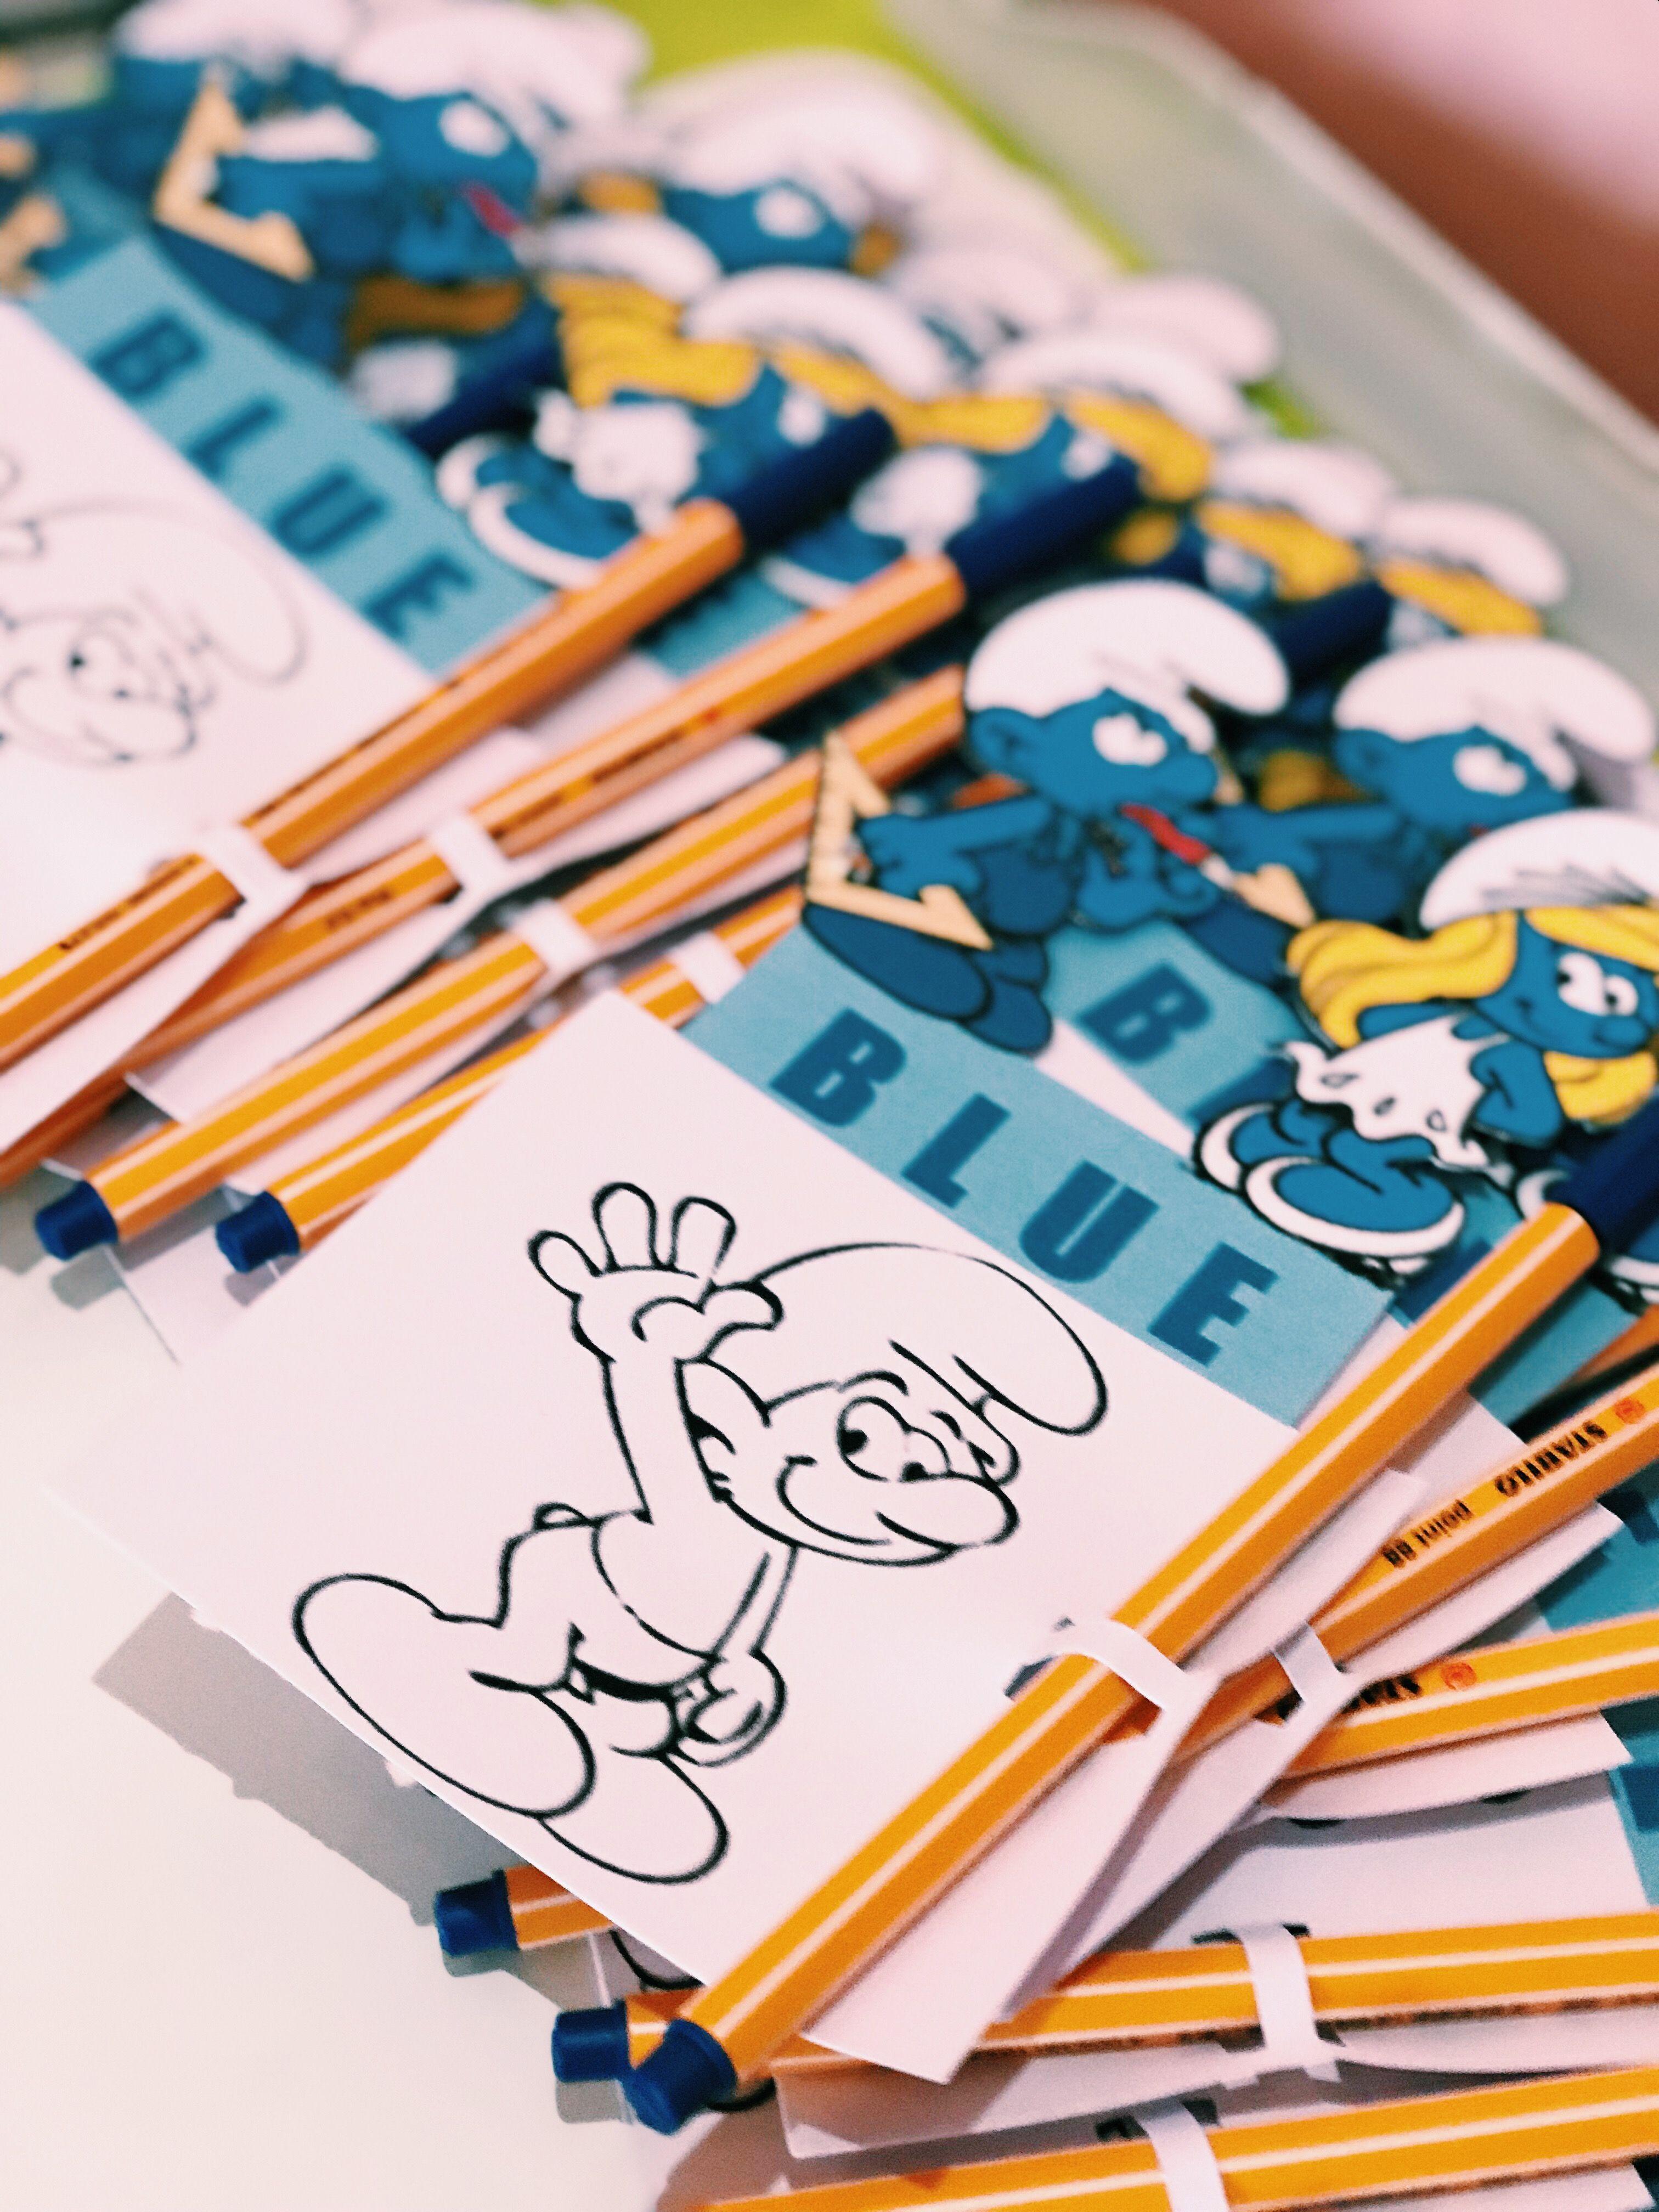 Give Away For Blueday At School توزيعات للمدرسة لطلاب الروضة اليوم الأزرق Kindergarten Activities Toddler Girl Style Senses Preschool